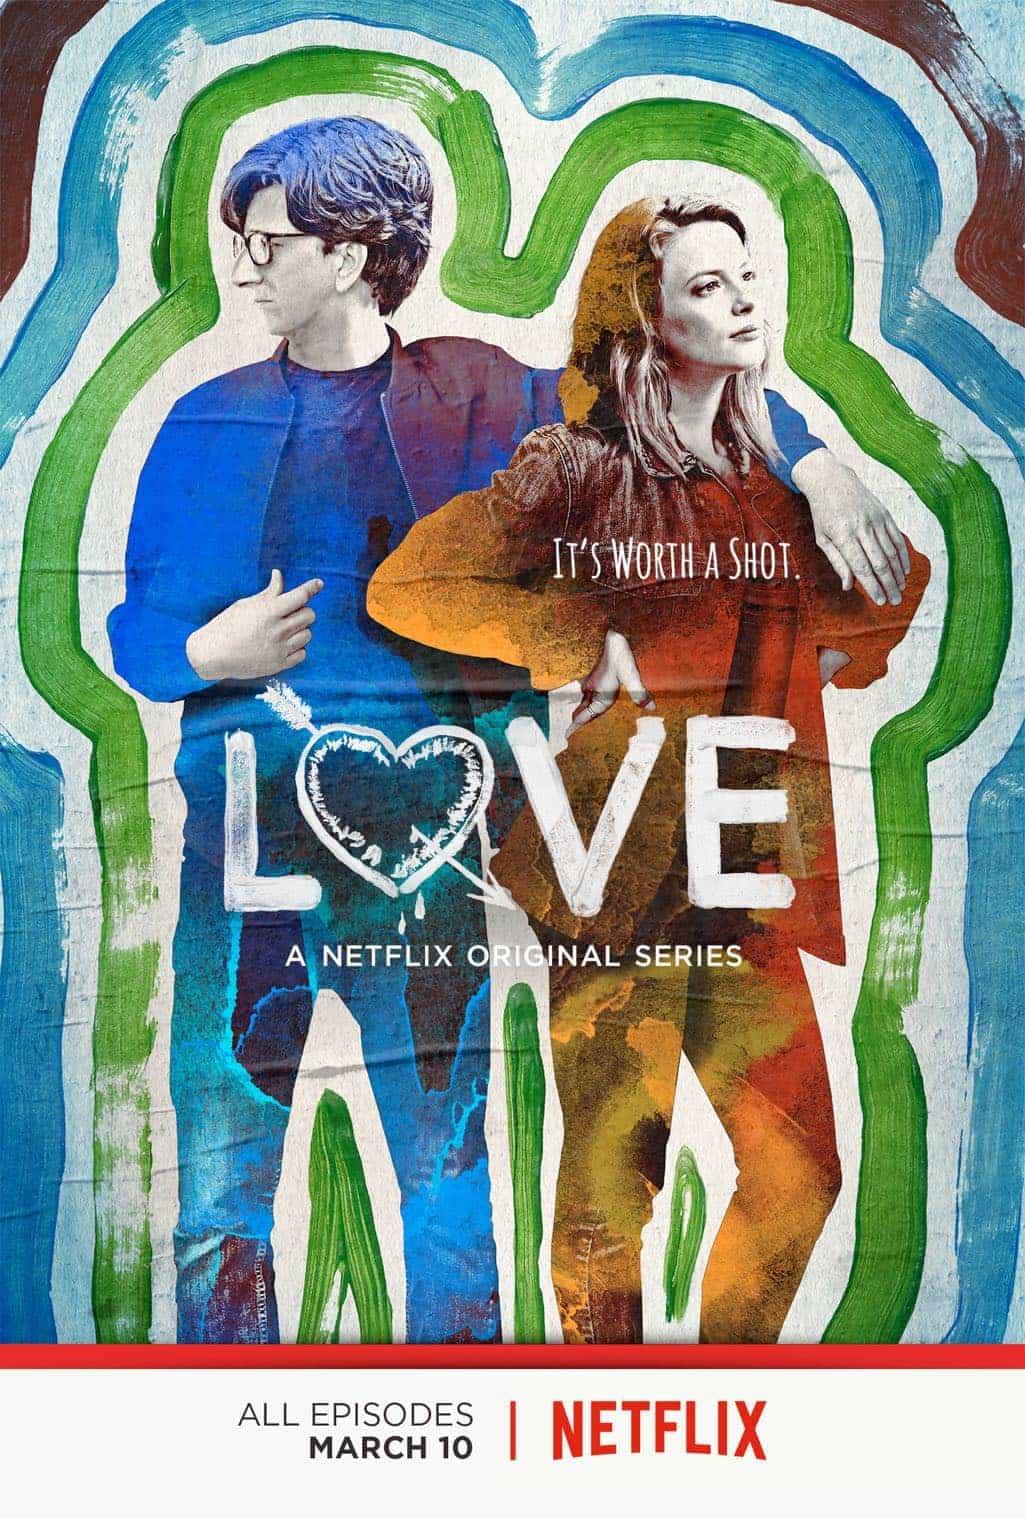 Love Season 2 Poster Netflix